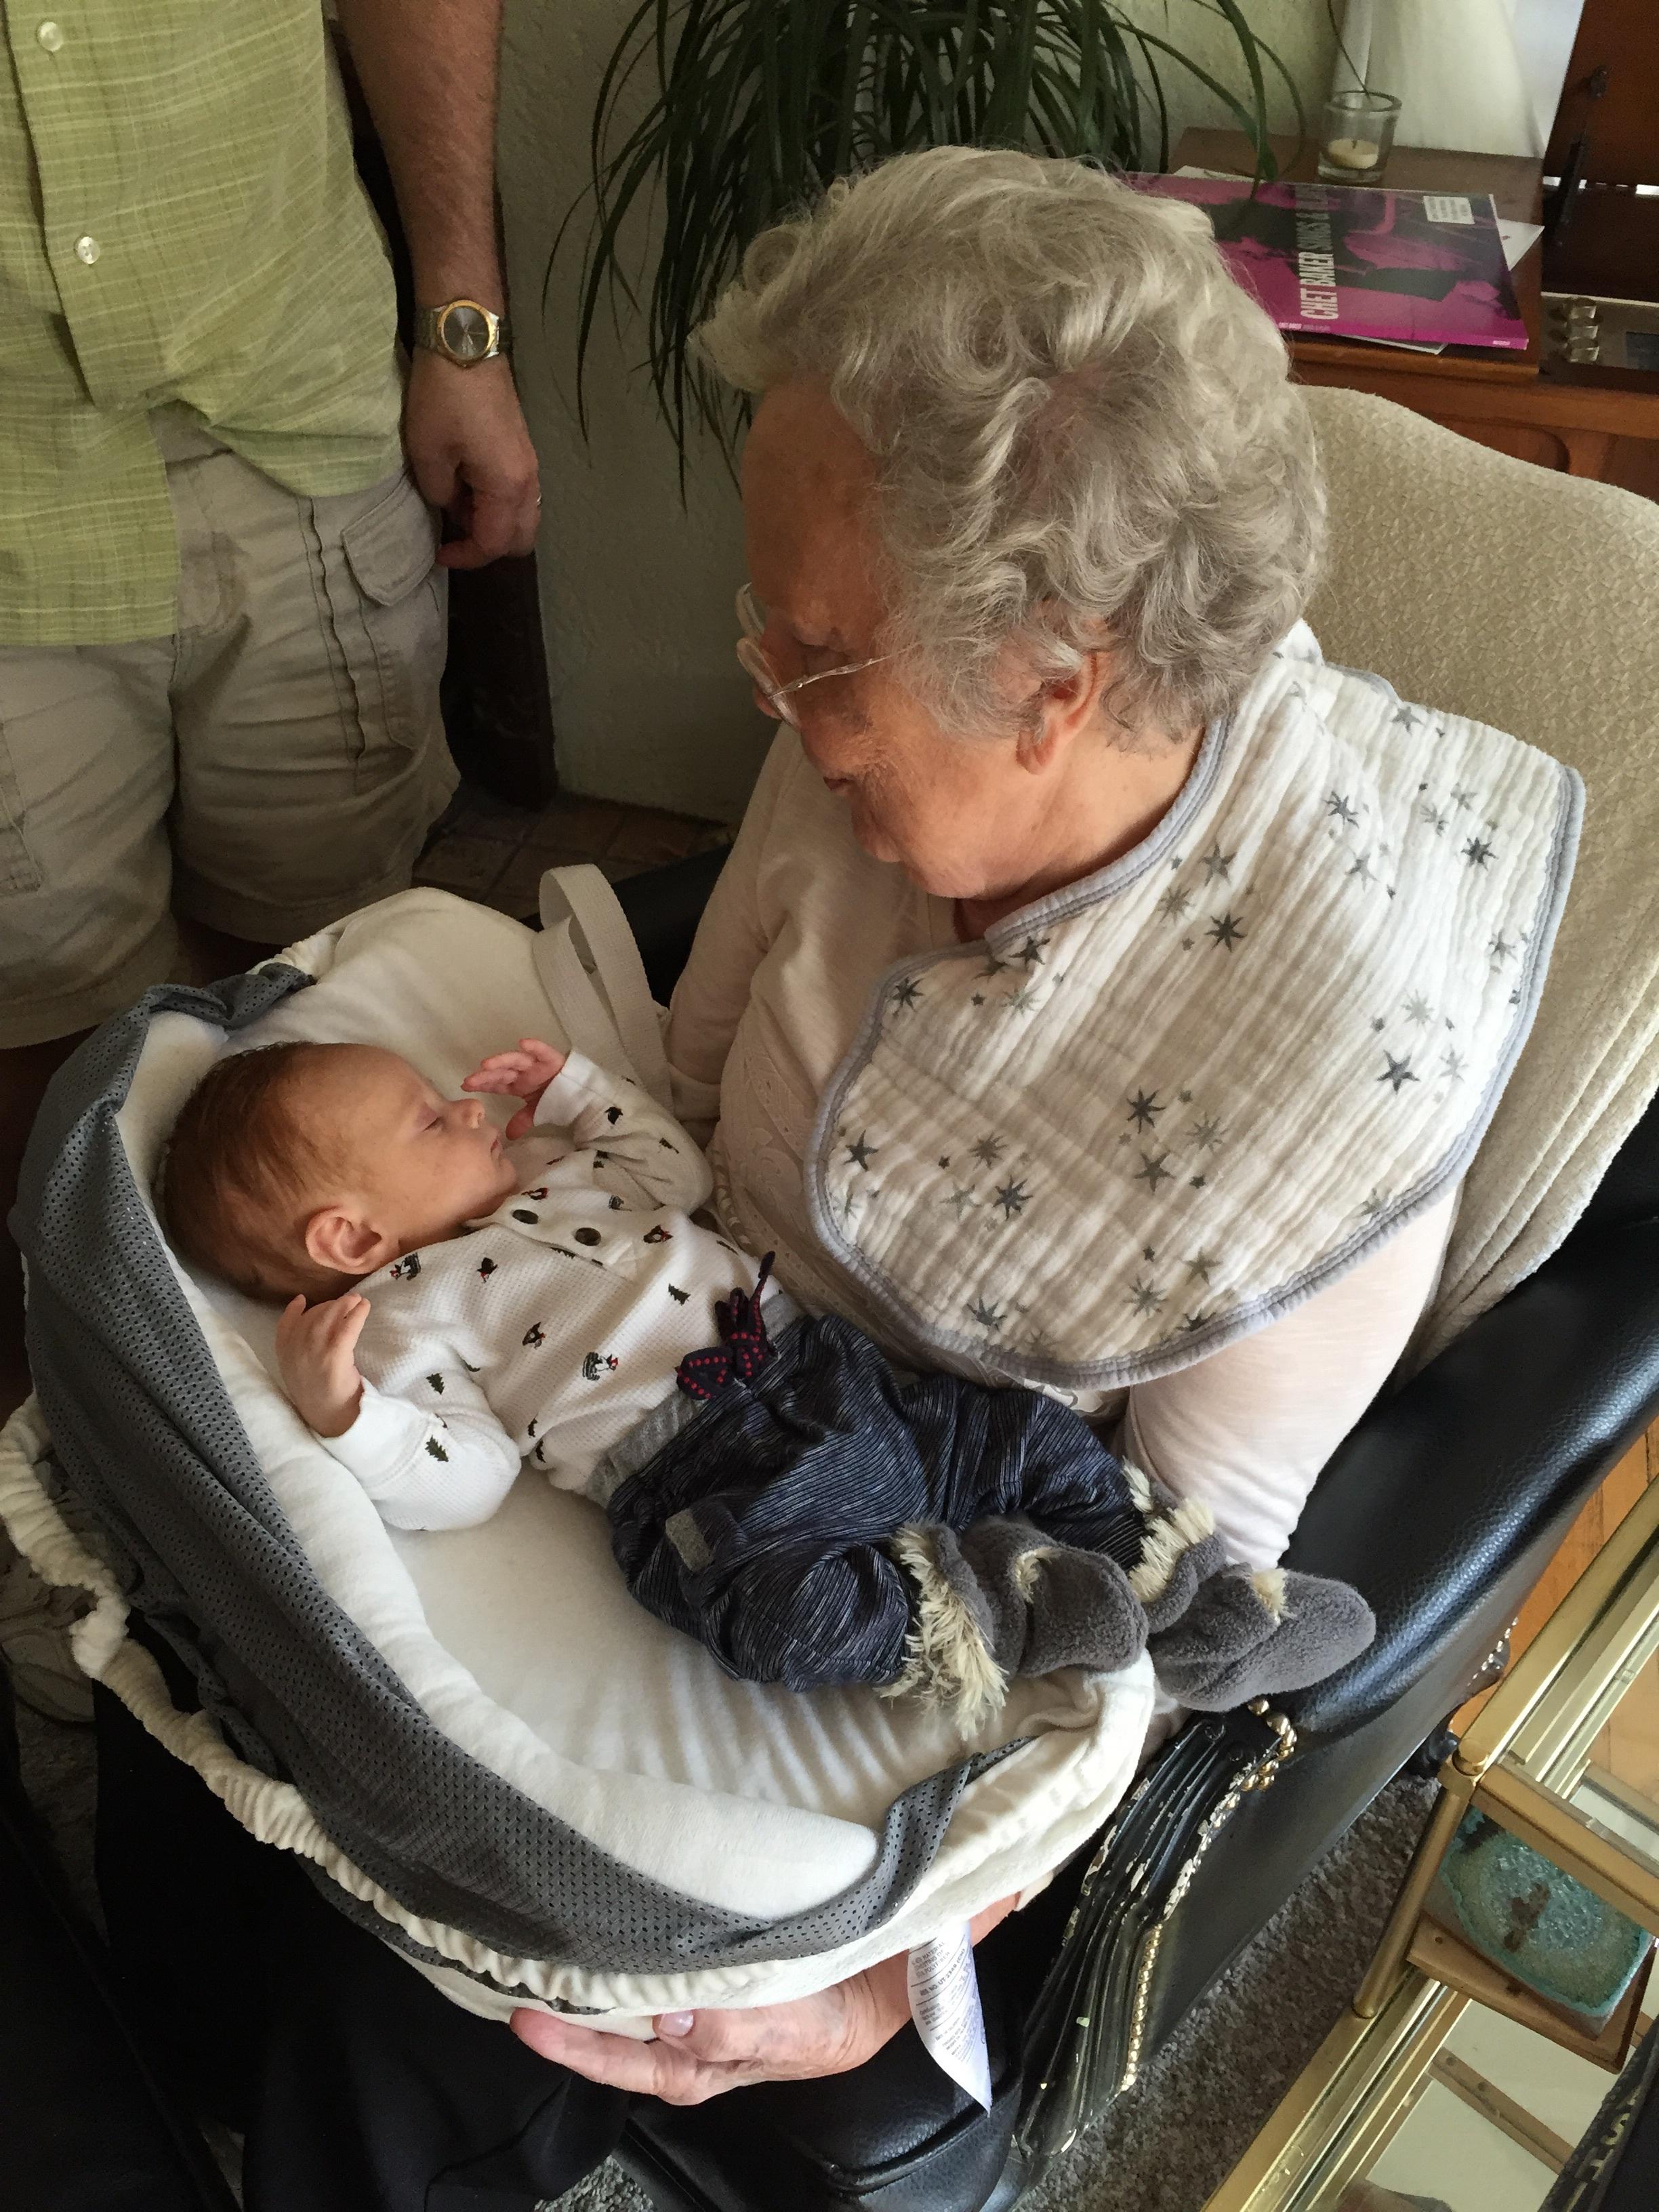 Meeting great Granny ❤️❤️❤️❤️